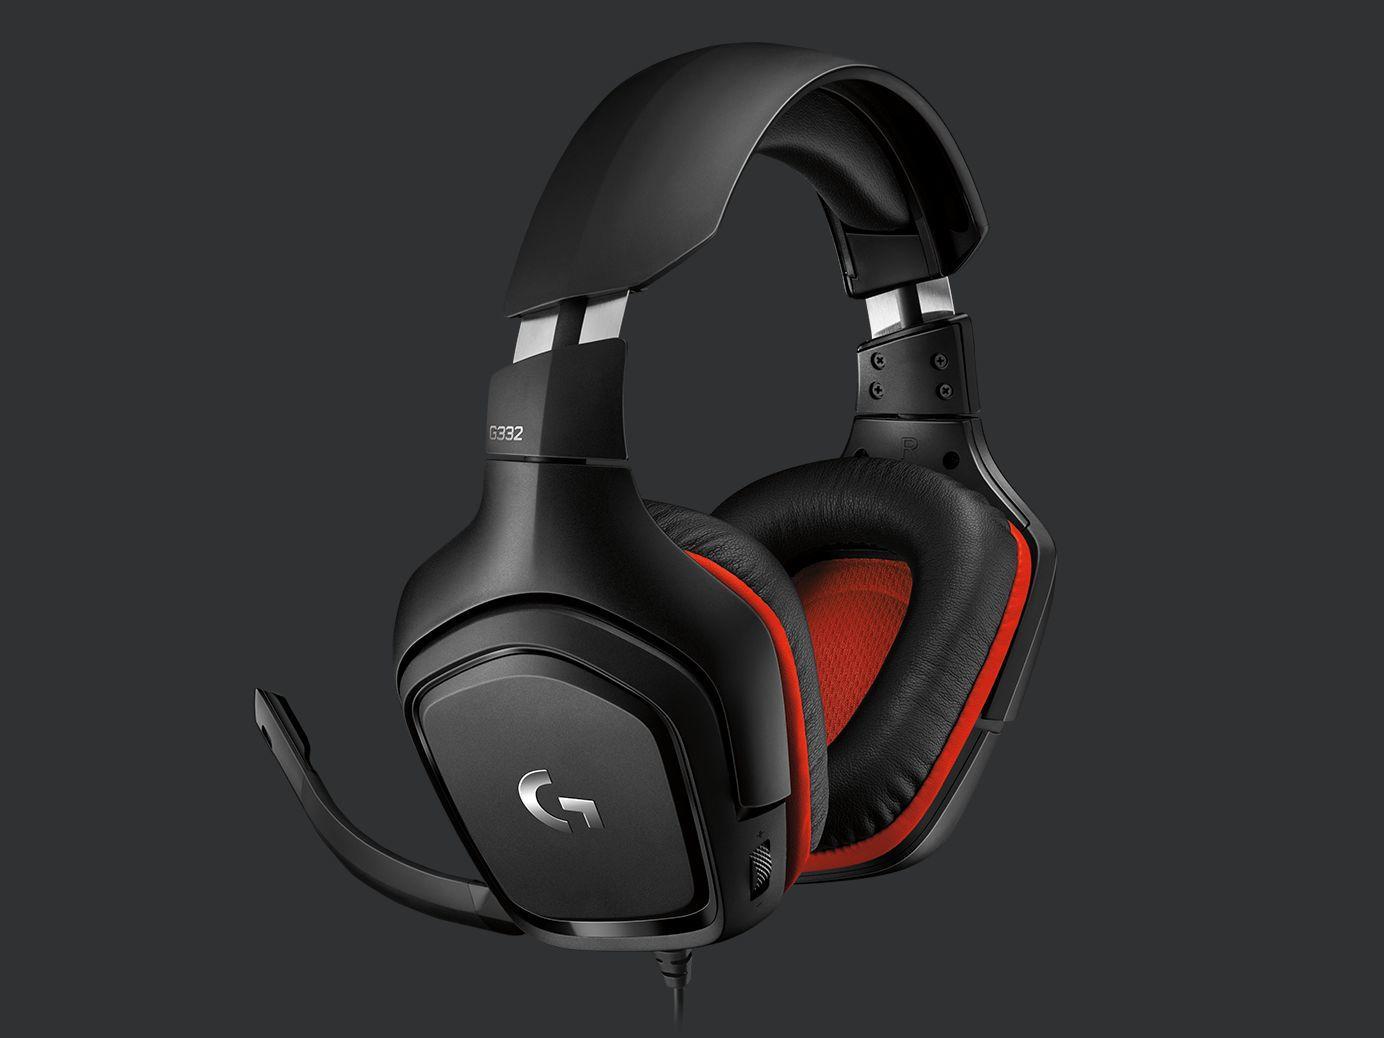 Logitech Gaming Headset G332 Symmetra - Black/Red - 3.5 MM, Leatherette austiņas